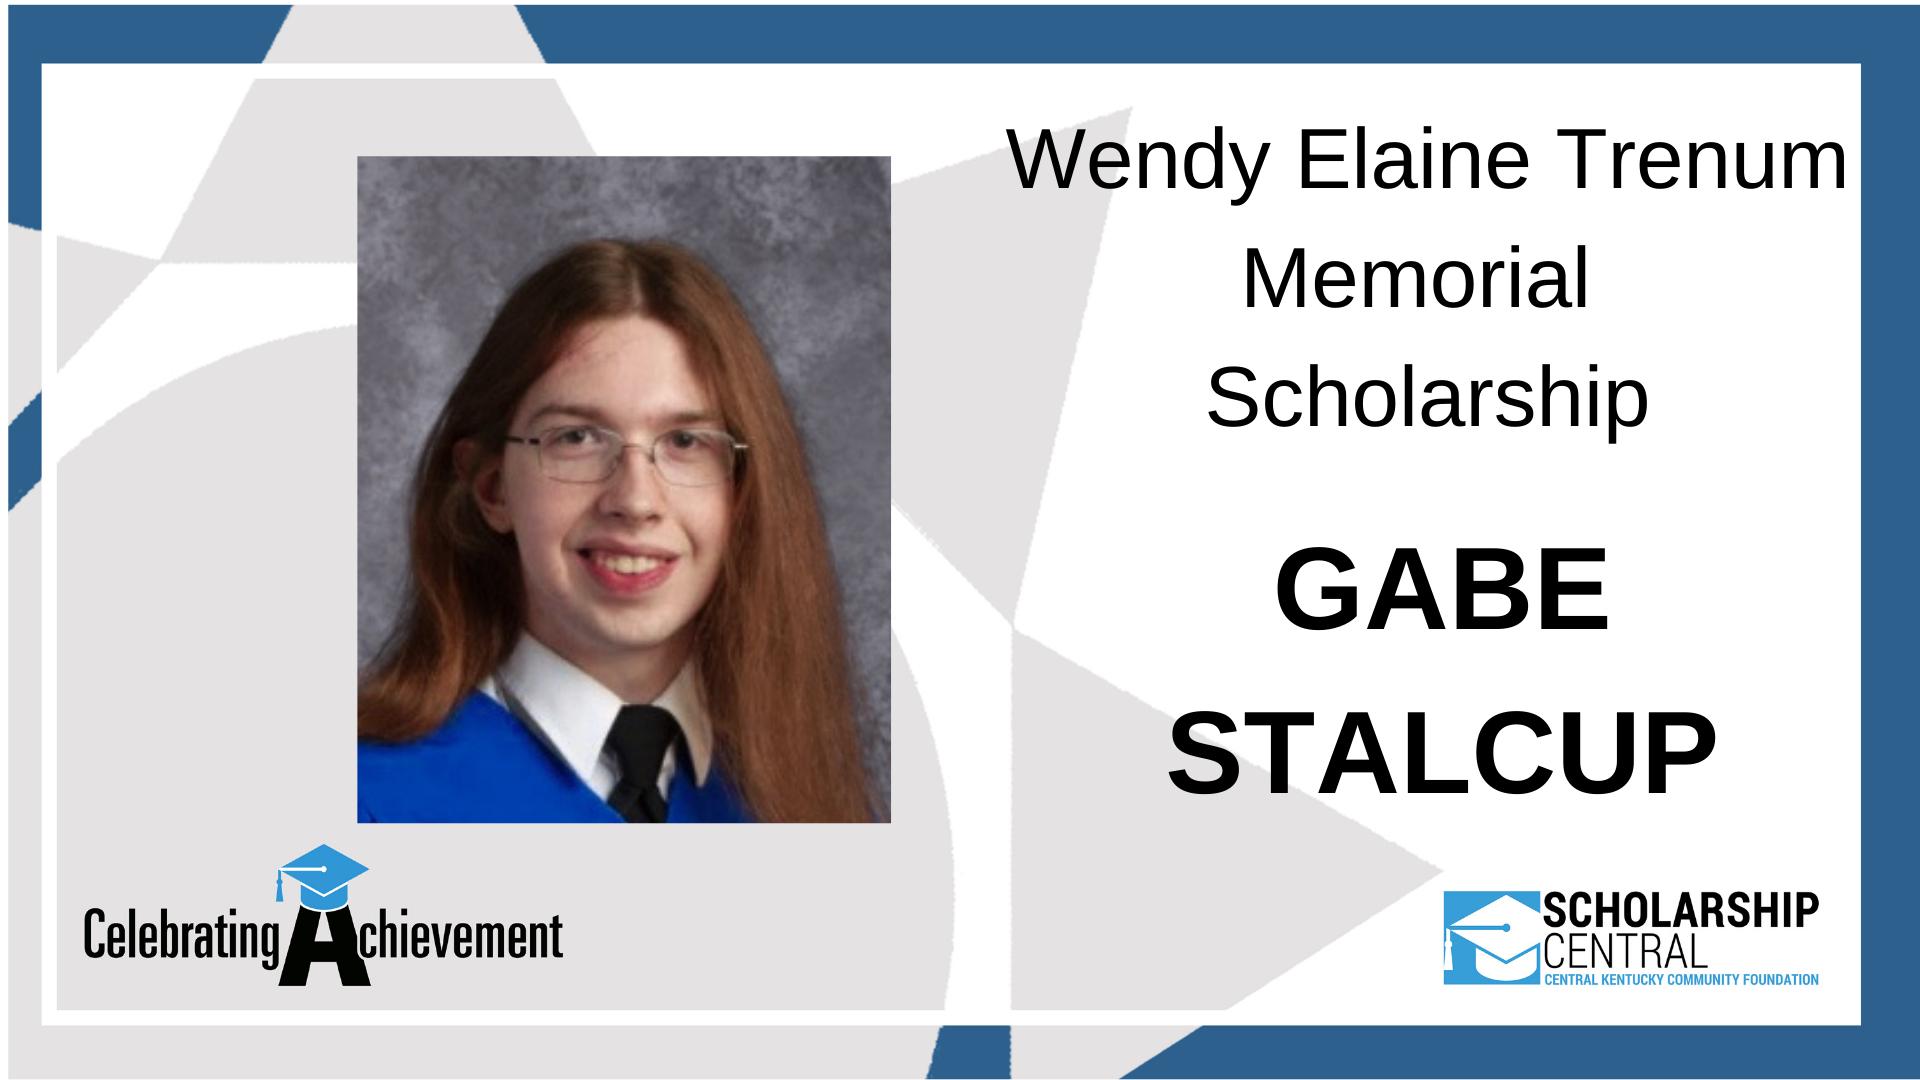 Wendy Elaine Trenum Scholarship